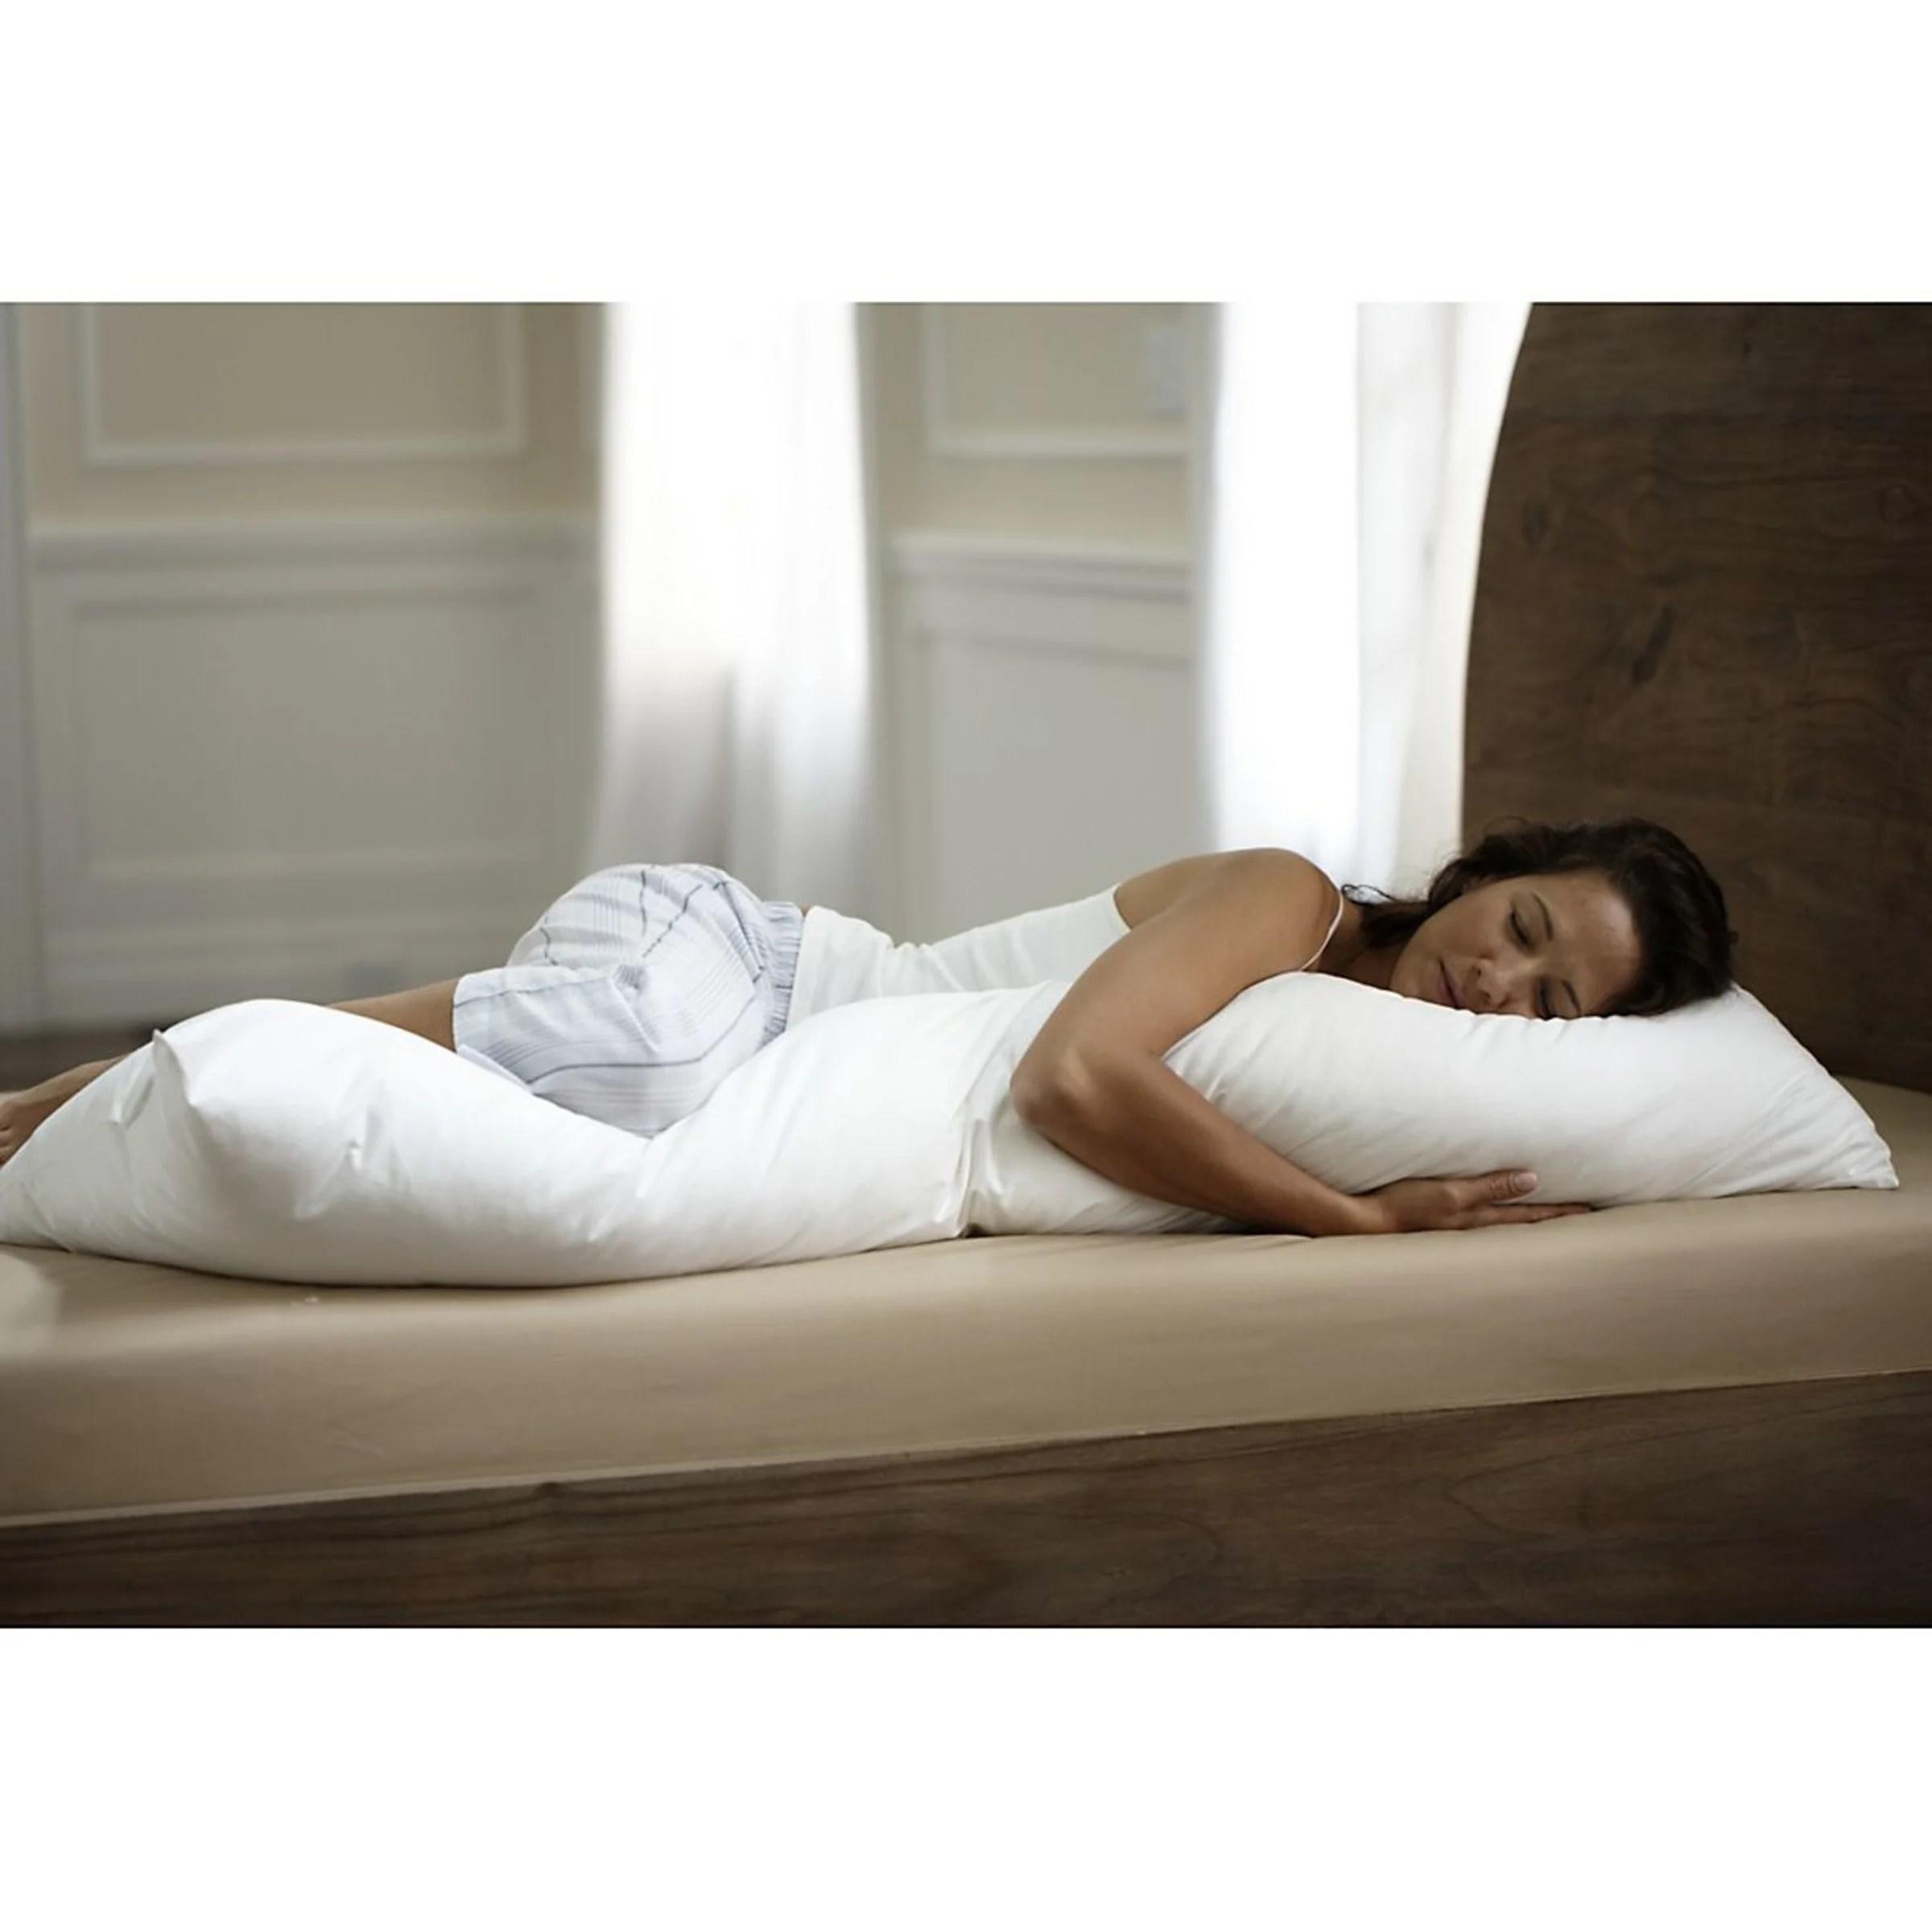 cotton percale body pillow protective cover